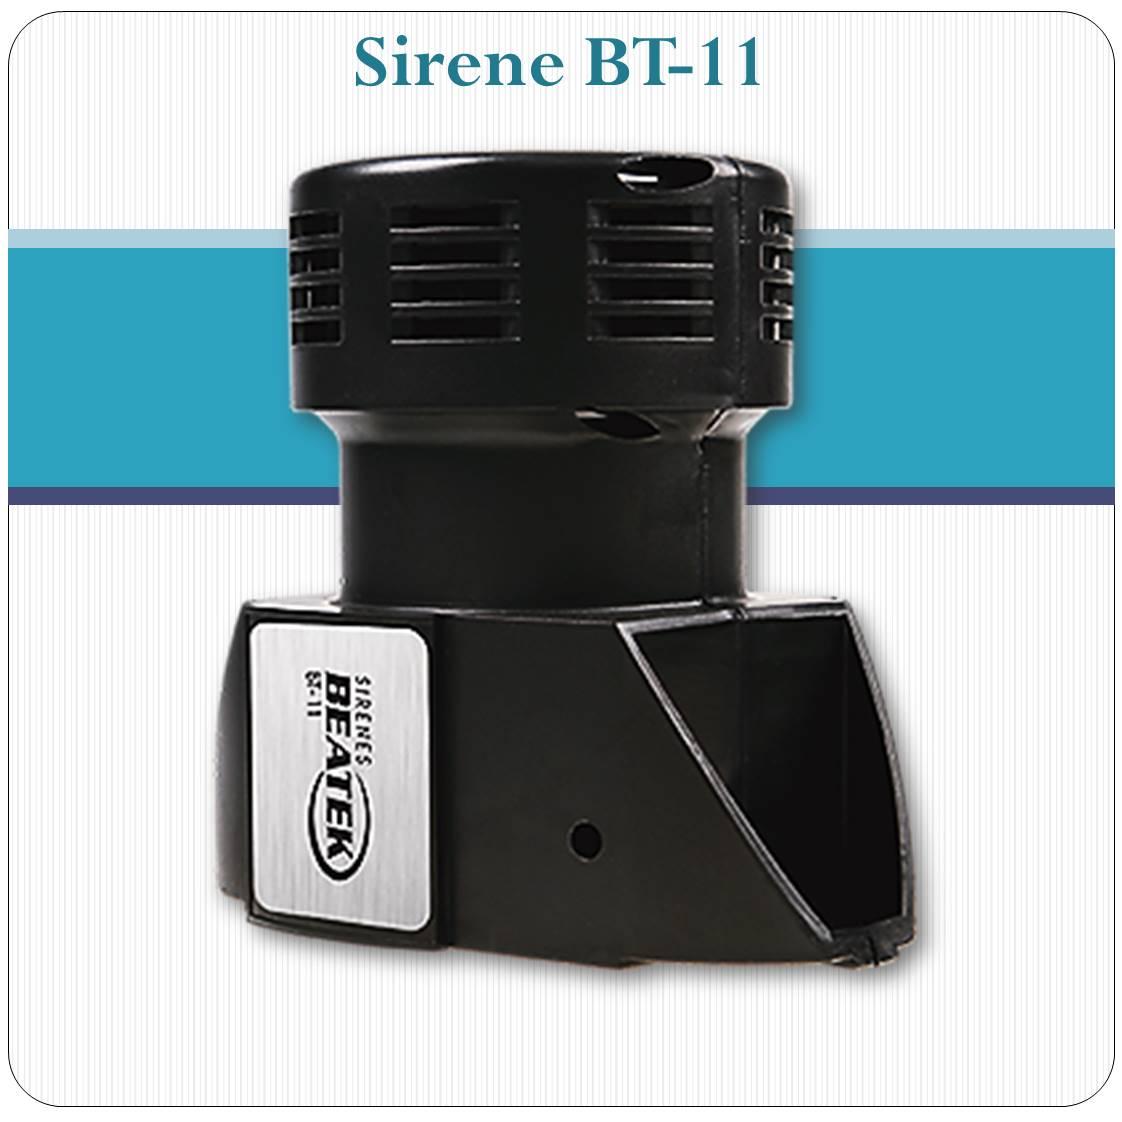 Sirene Eletromecânica BT-11 - 1500 metros